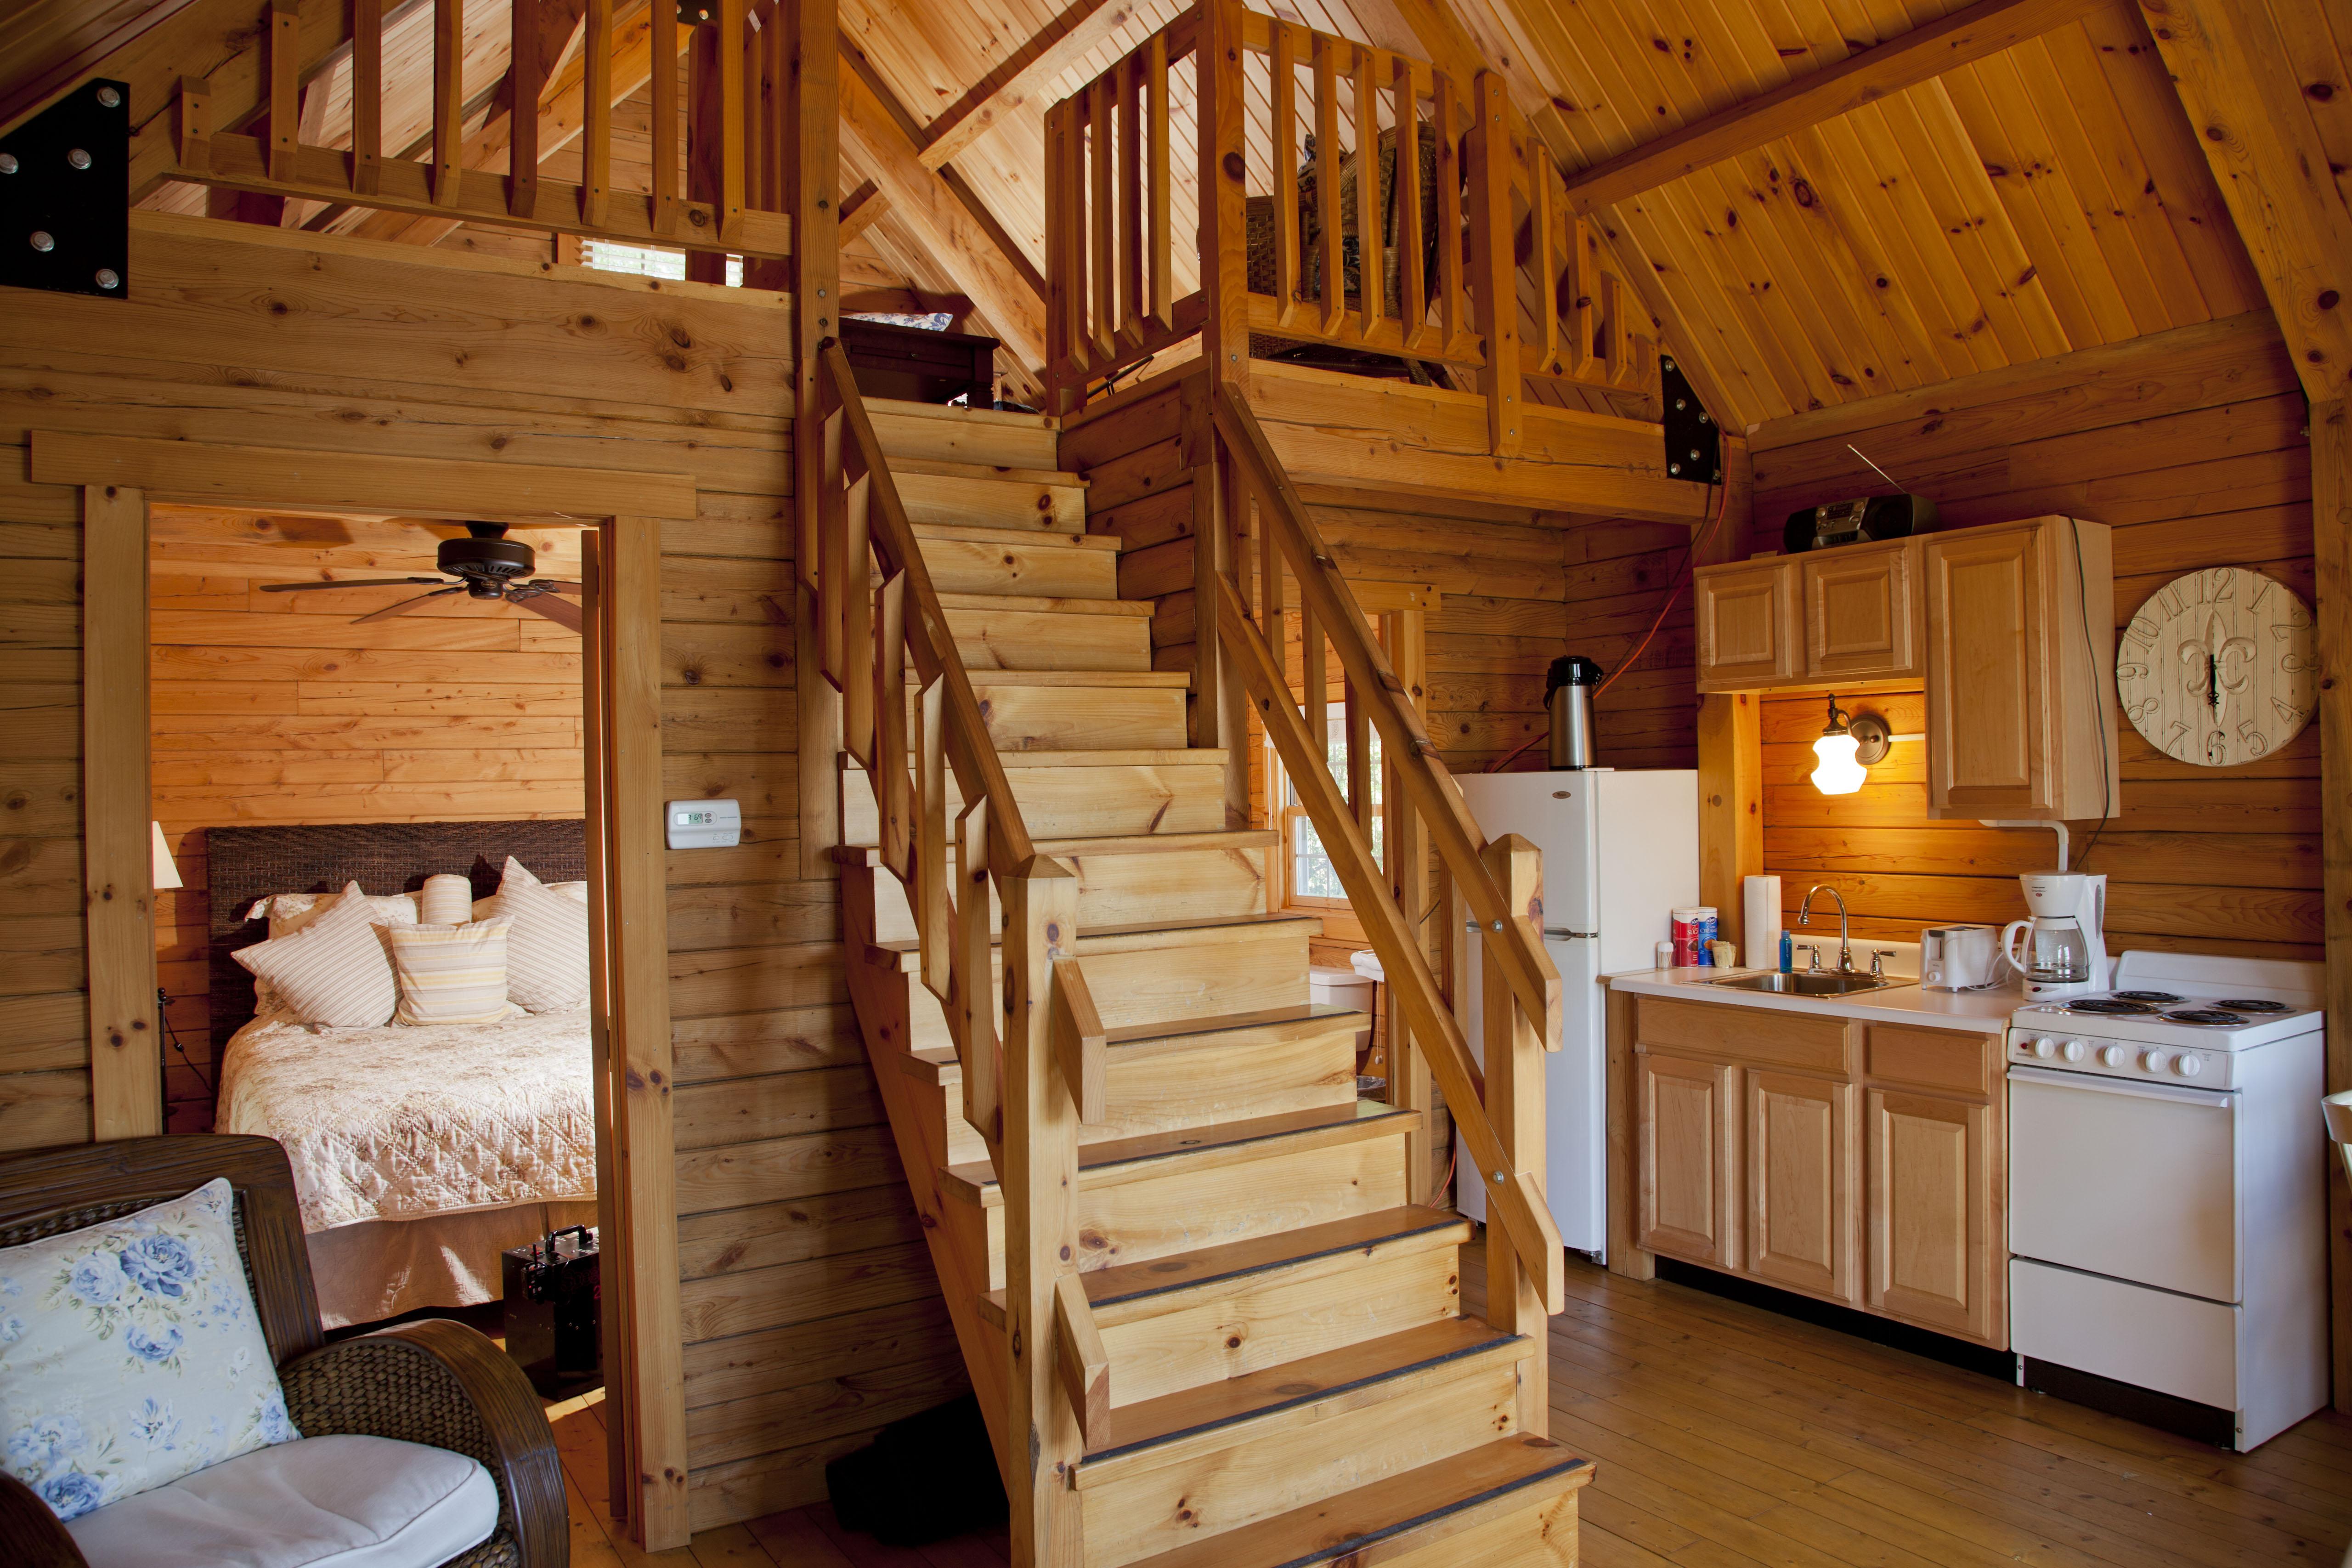 log-cabin-with-loft5